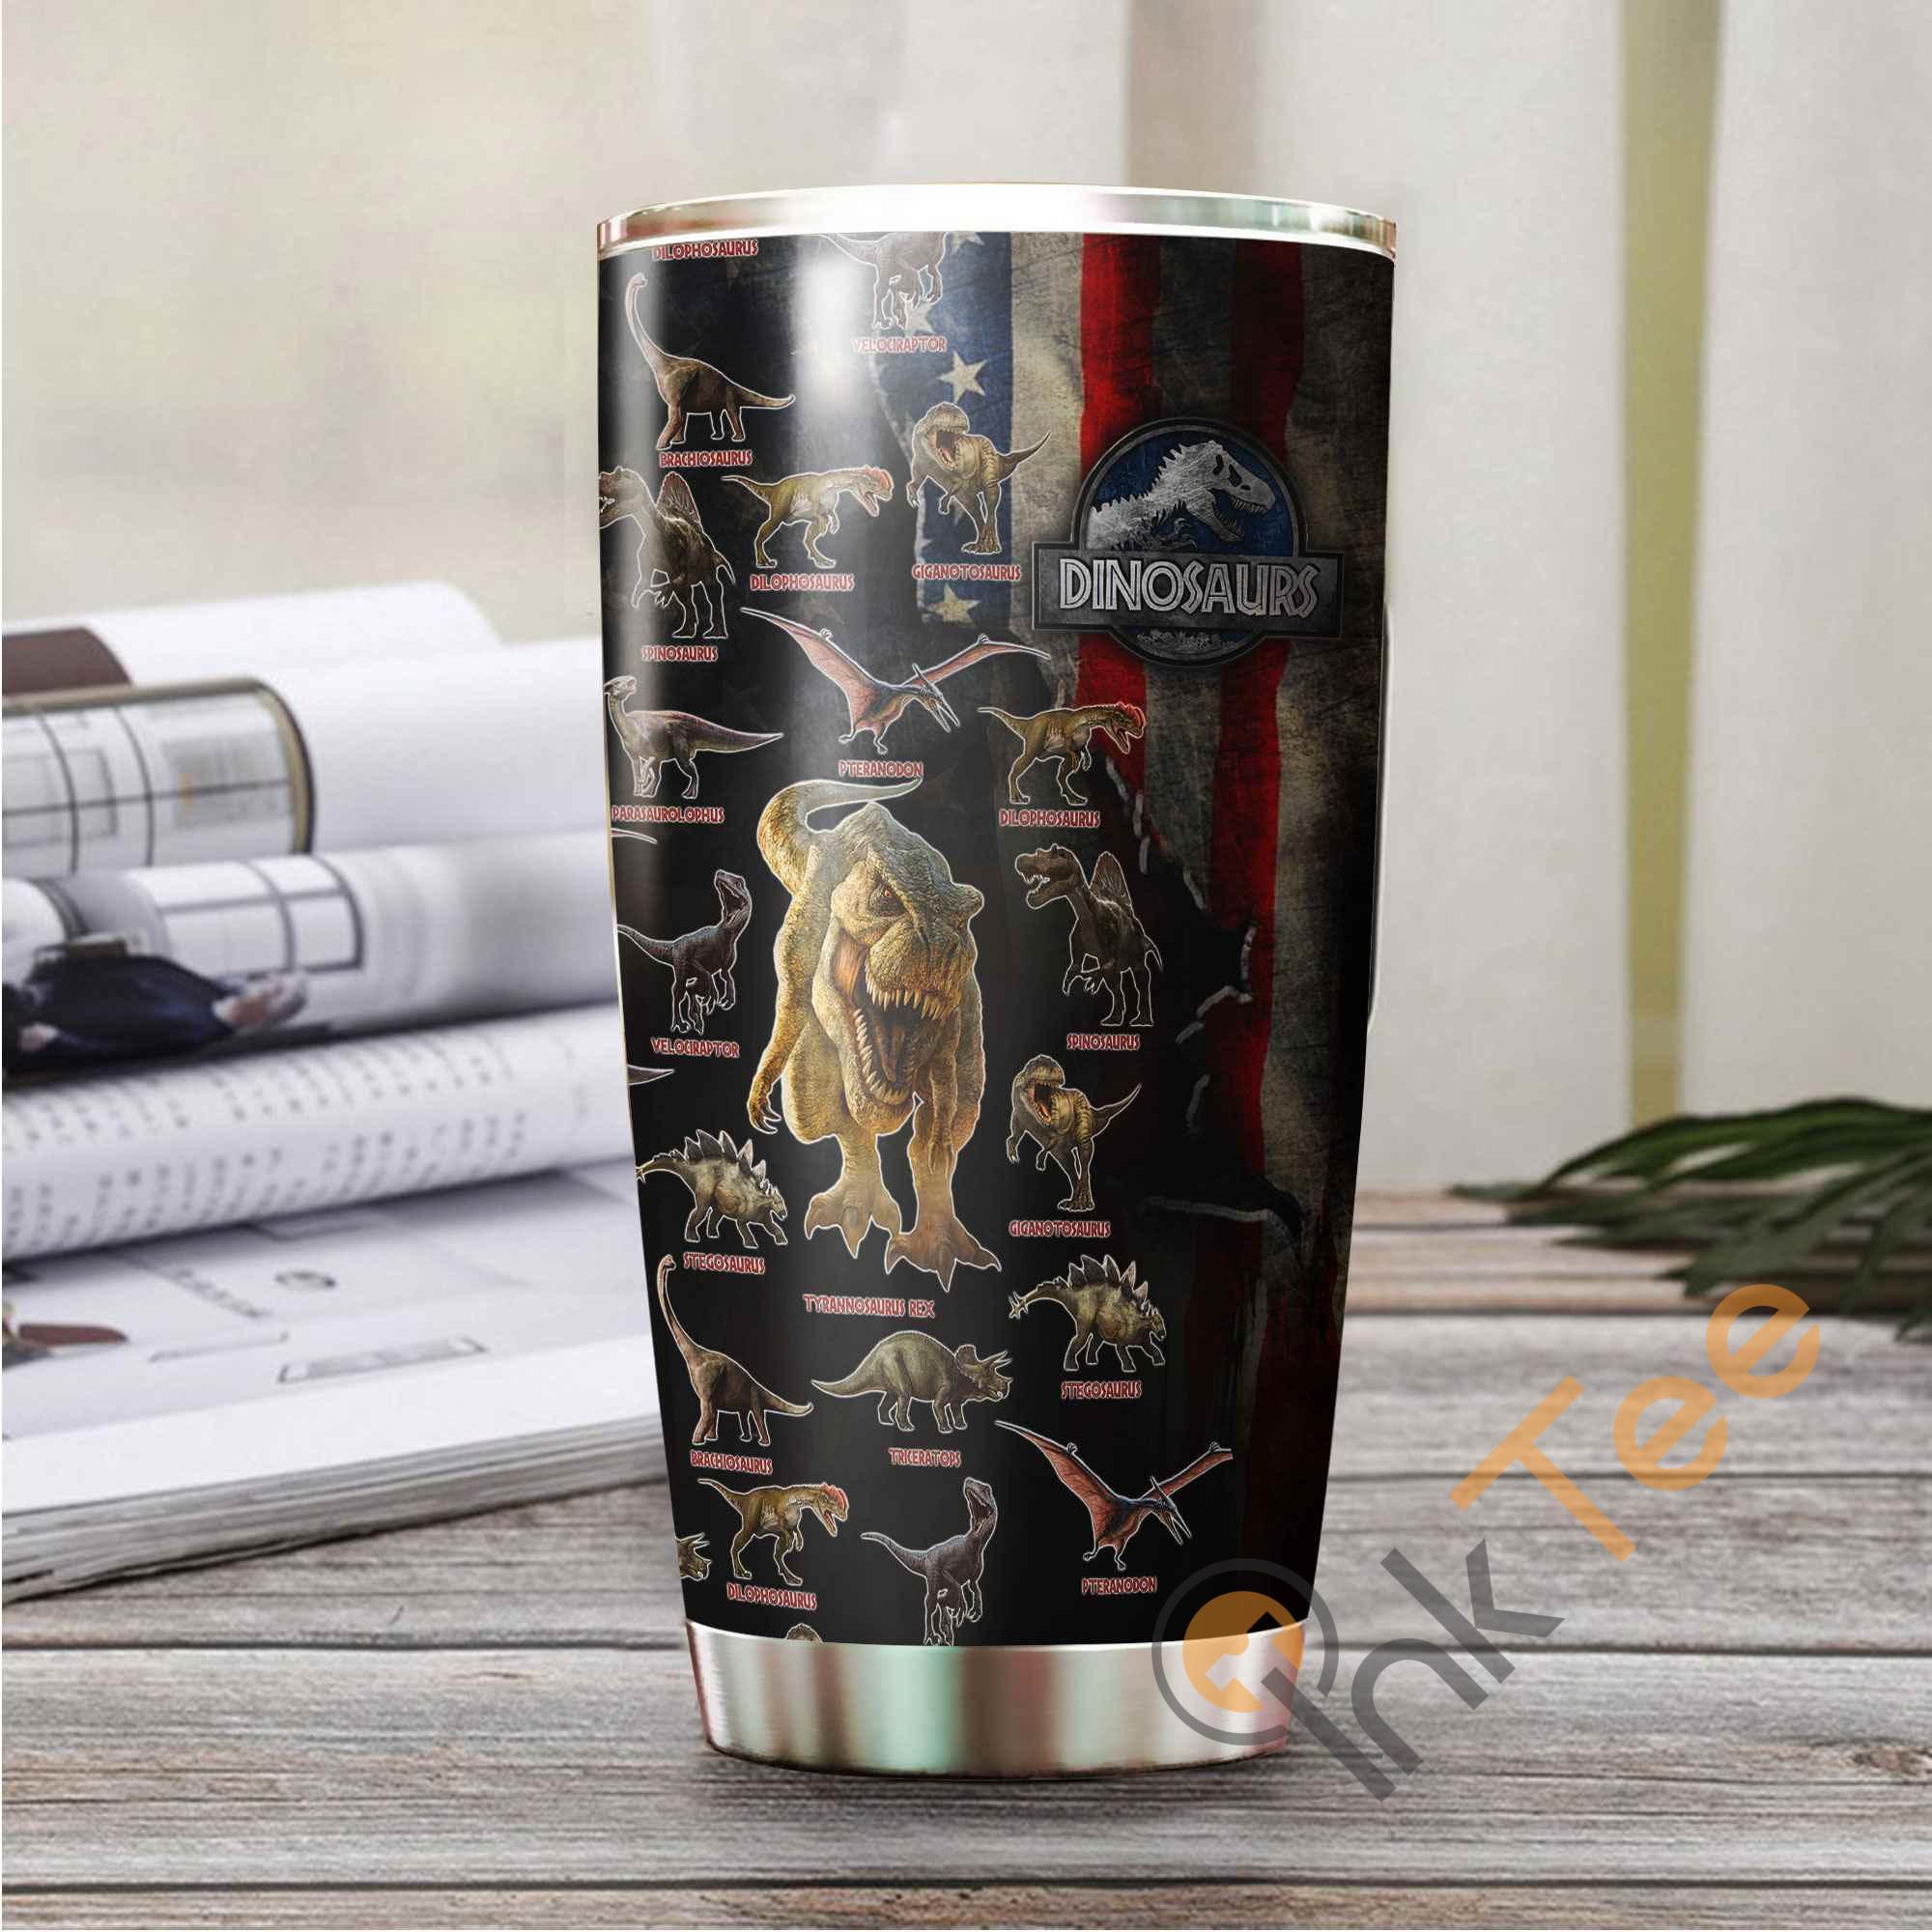 Amazing Dinosaurs Collection Art Amazon Best Seller Sku 3193 Stainless Steel Tumbler